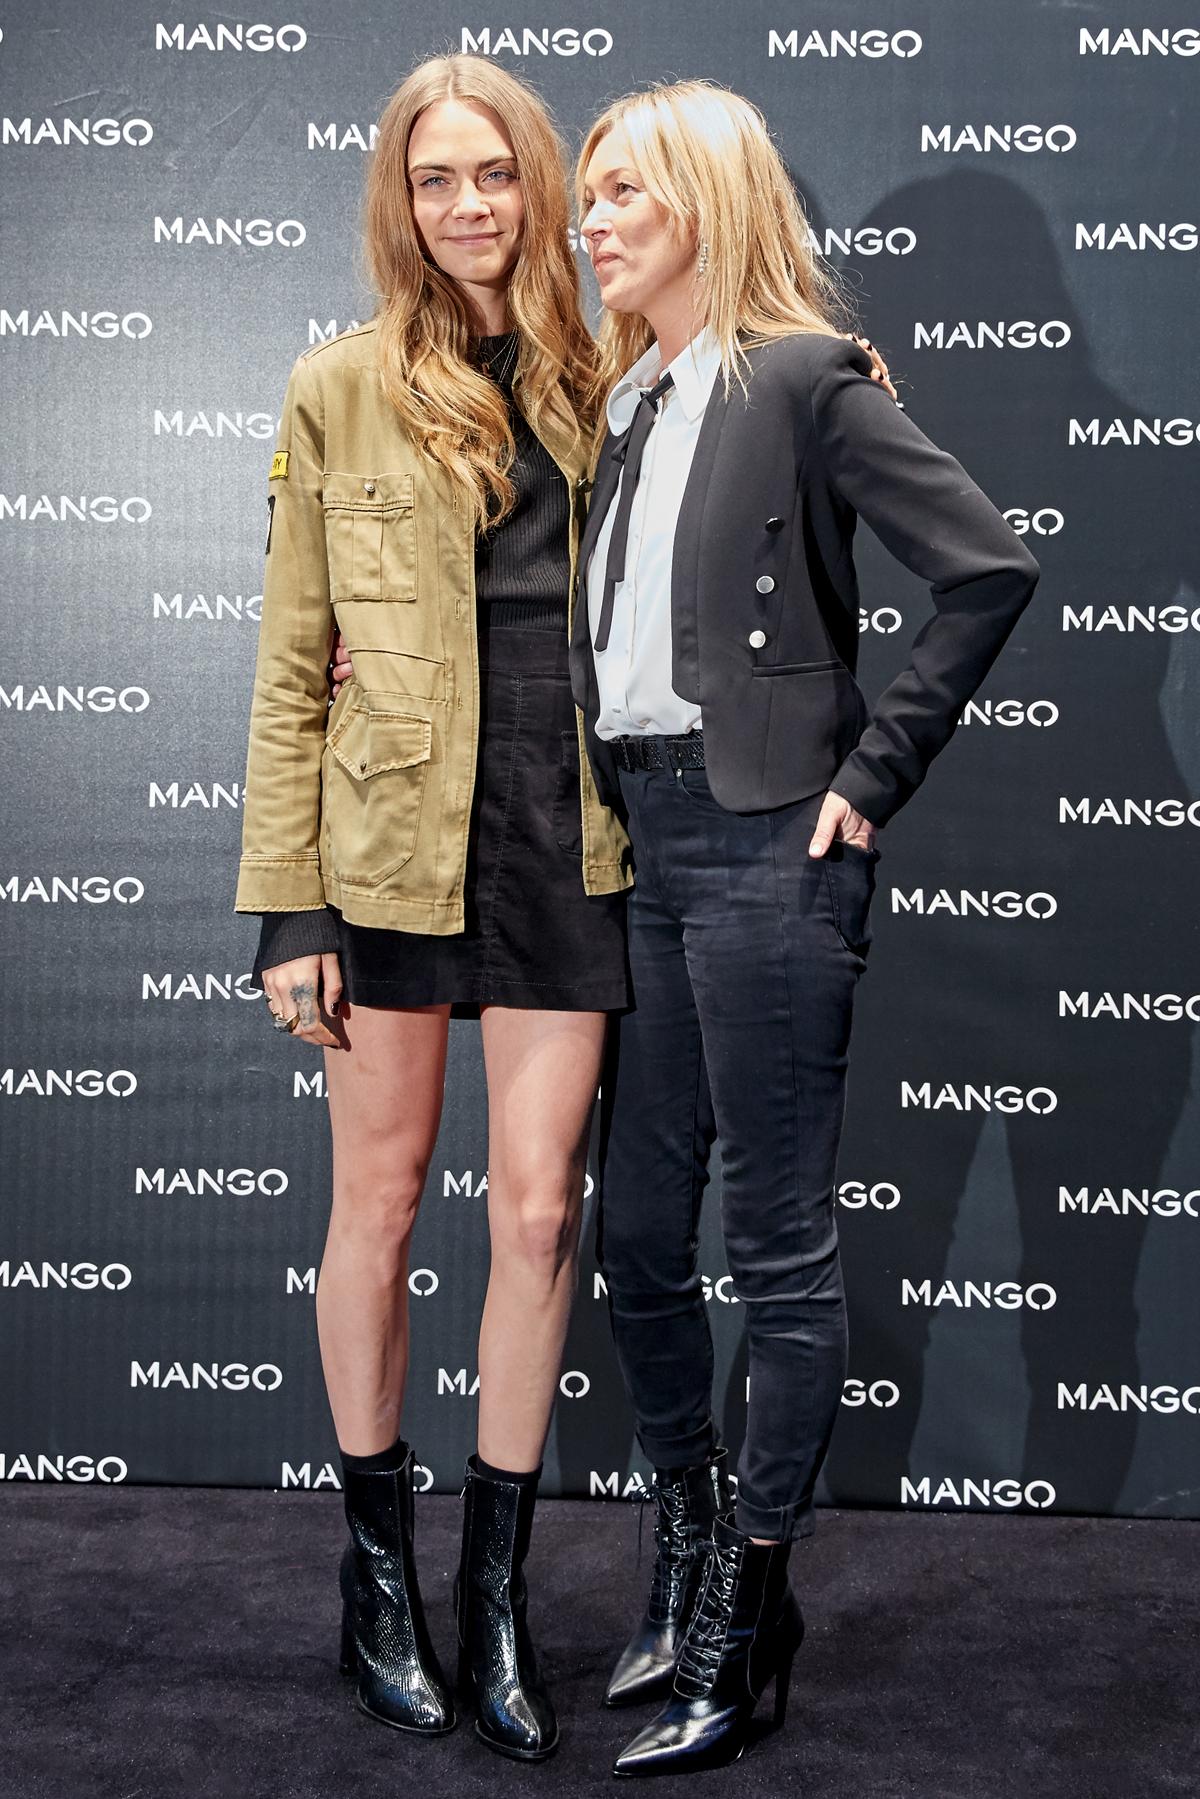 MANGO 2015 秋冬重量級品牌形象代言人Kate Moss以及Cara Delevingne共同出席 MANGO 在米蘭的代言記者會